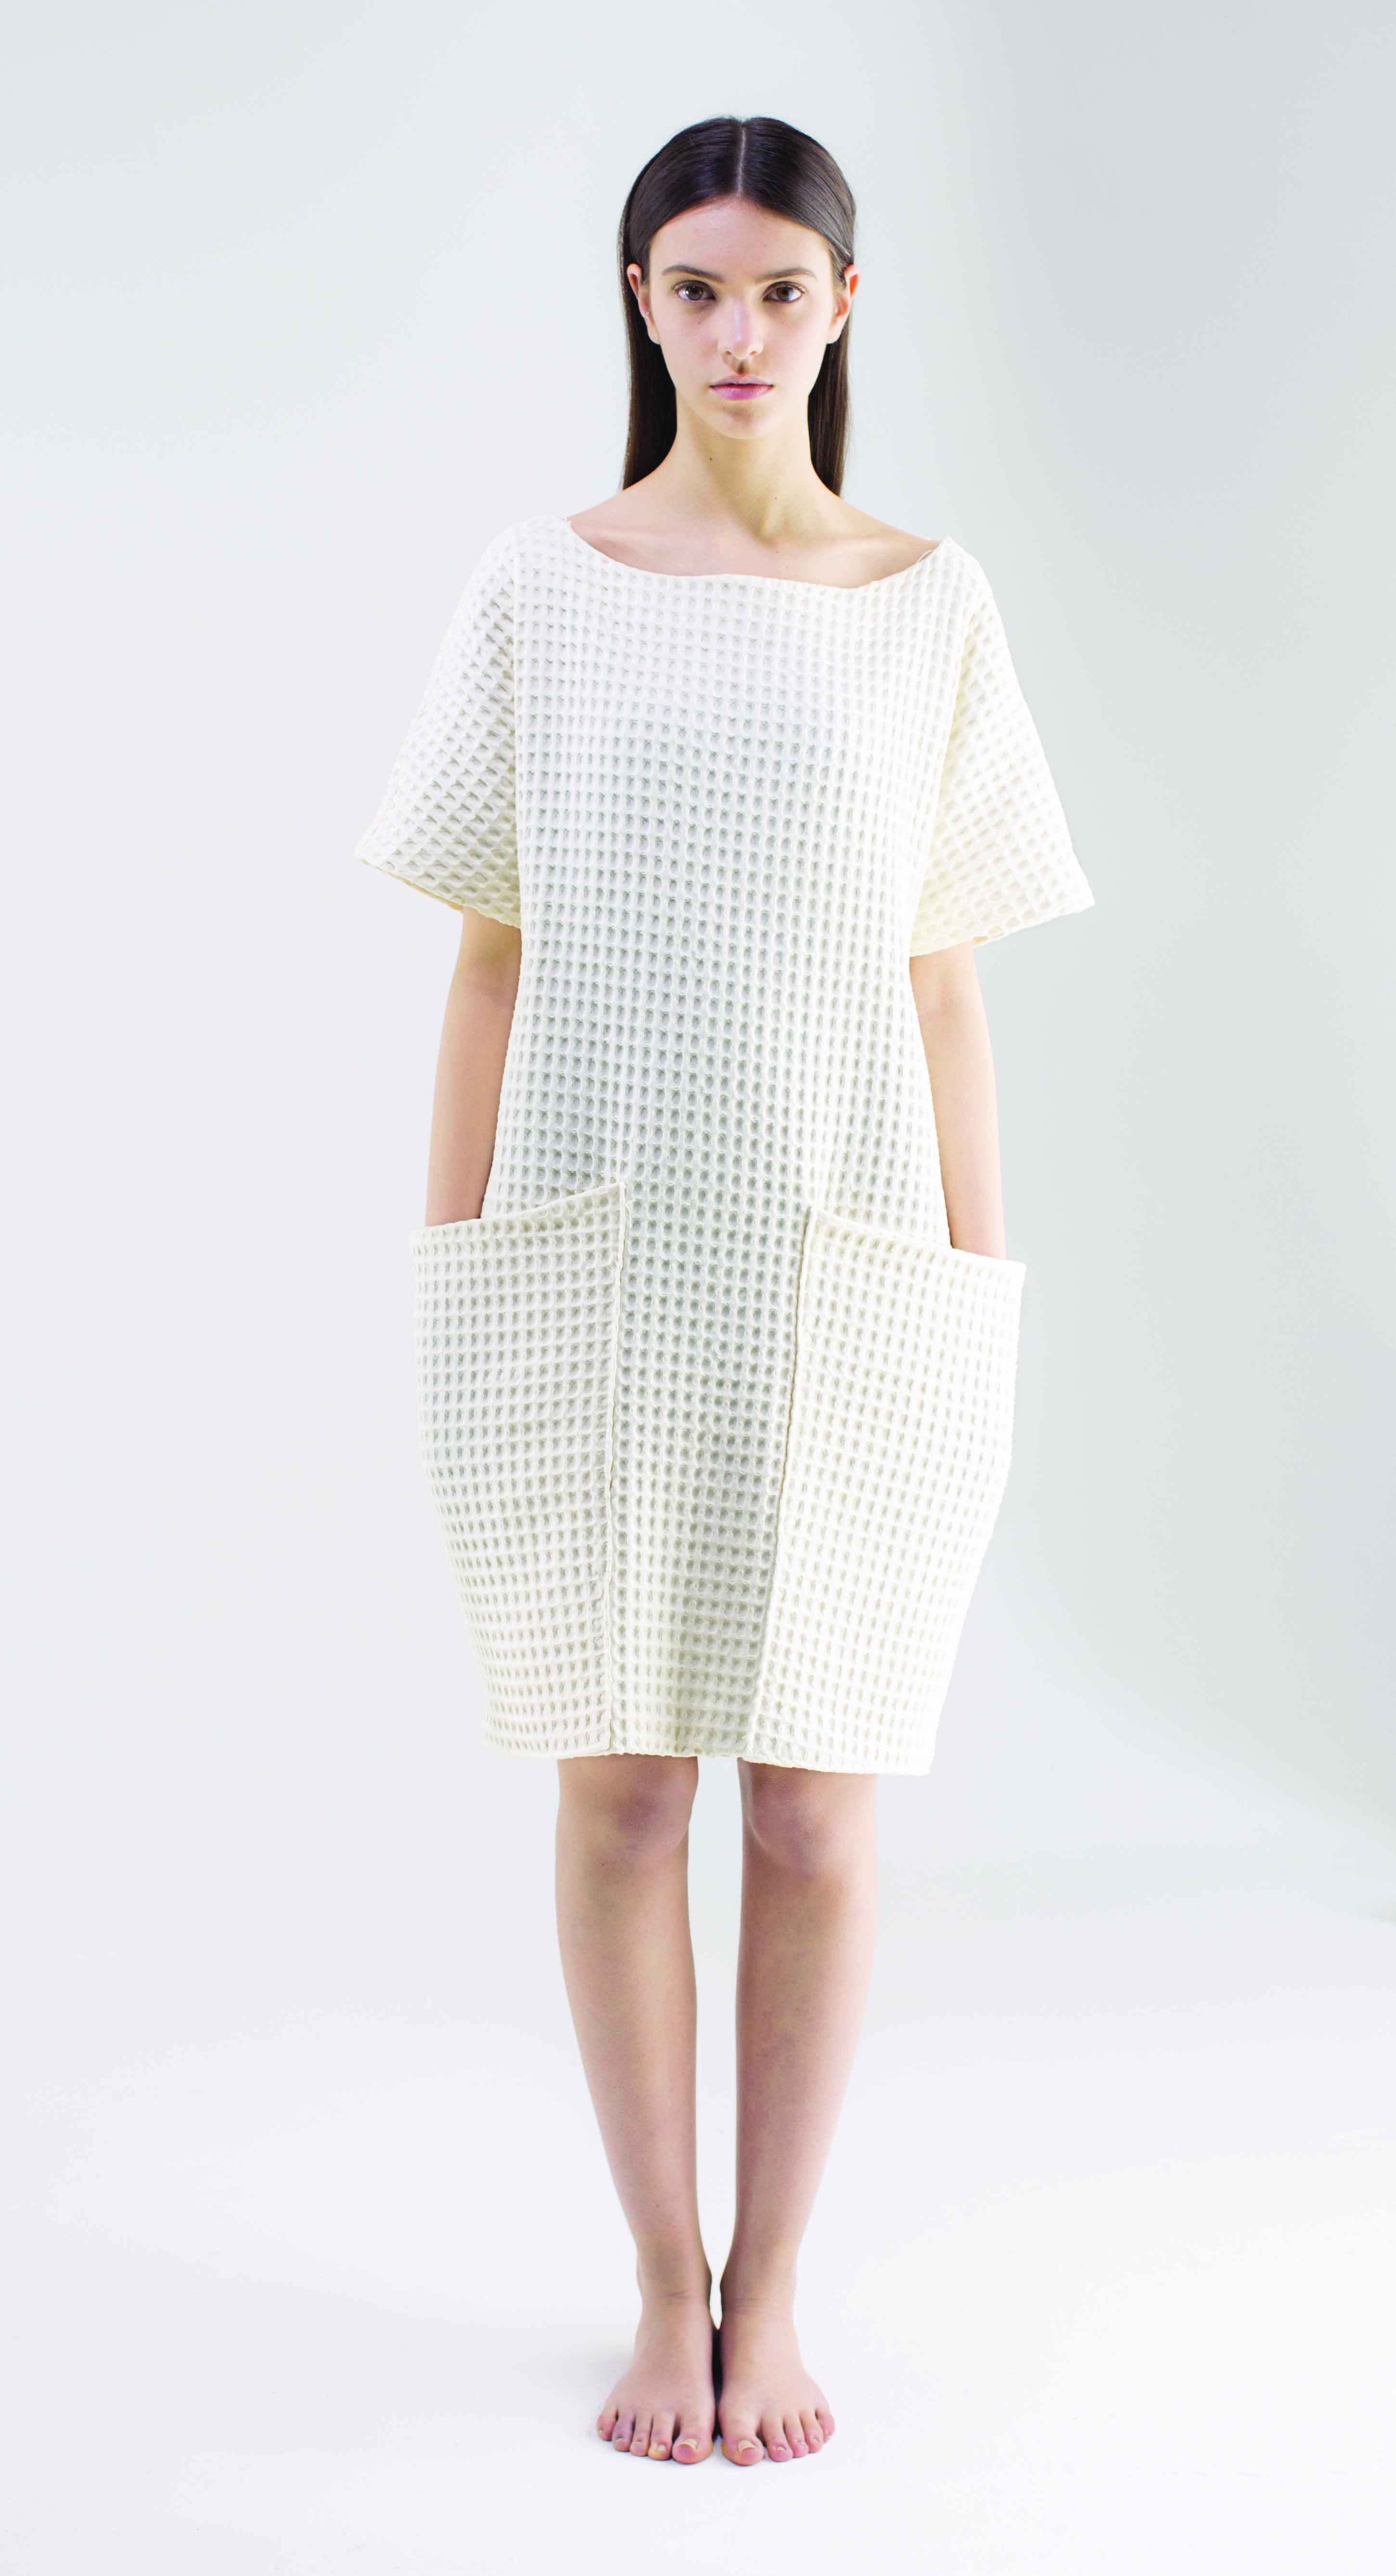 Vestae: Ratio Designed by Elisa Borboni and Sandra Shukstule  Material: waffle fabric